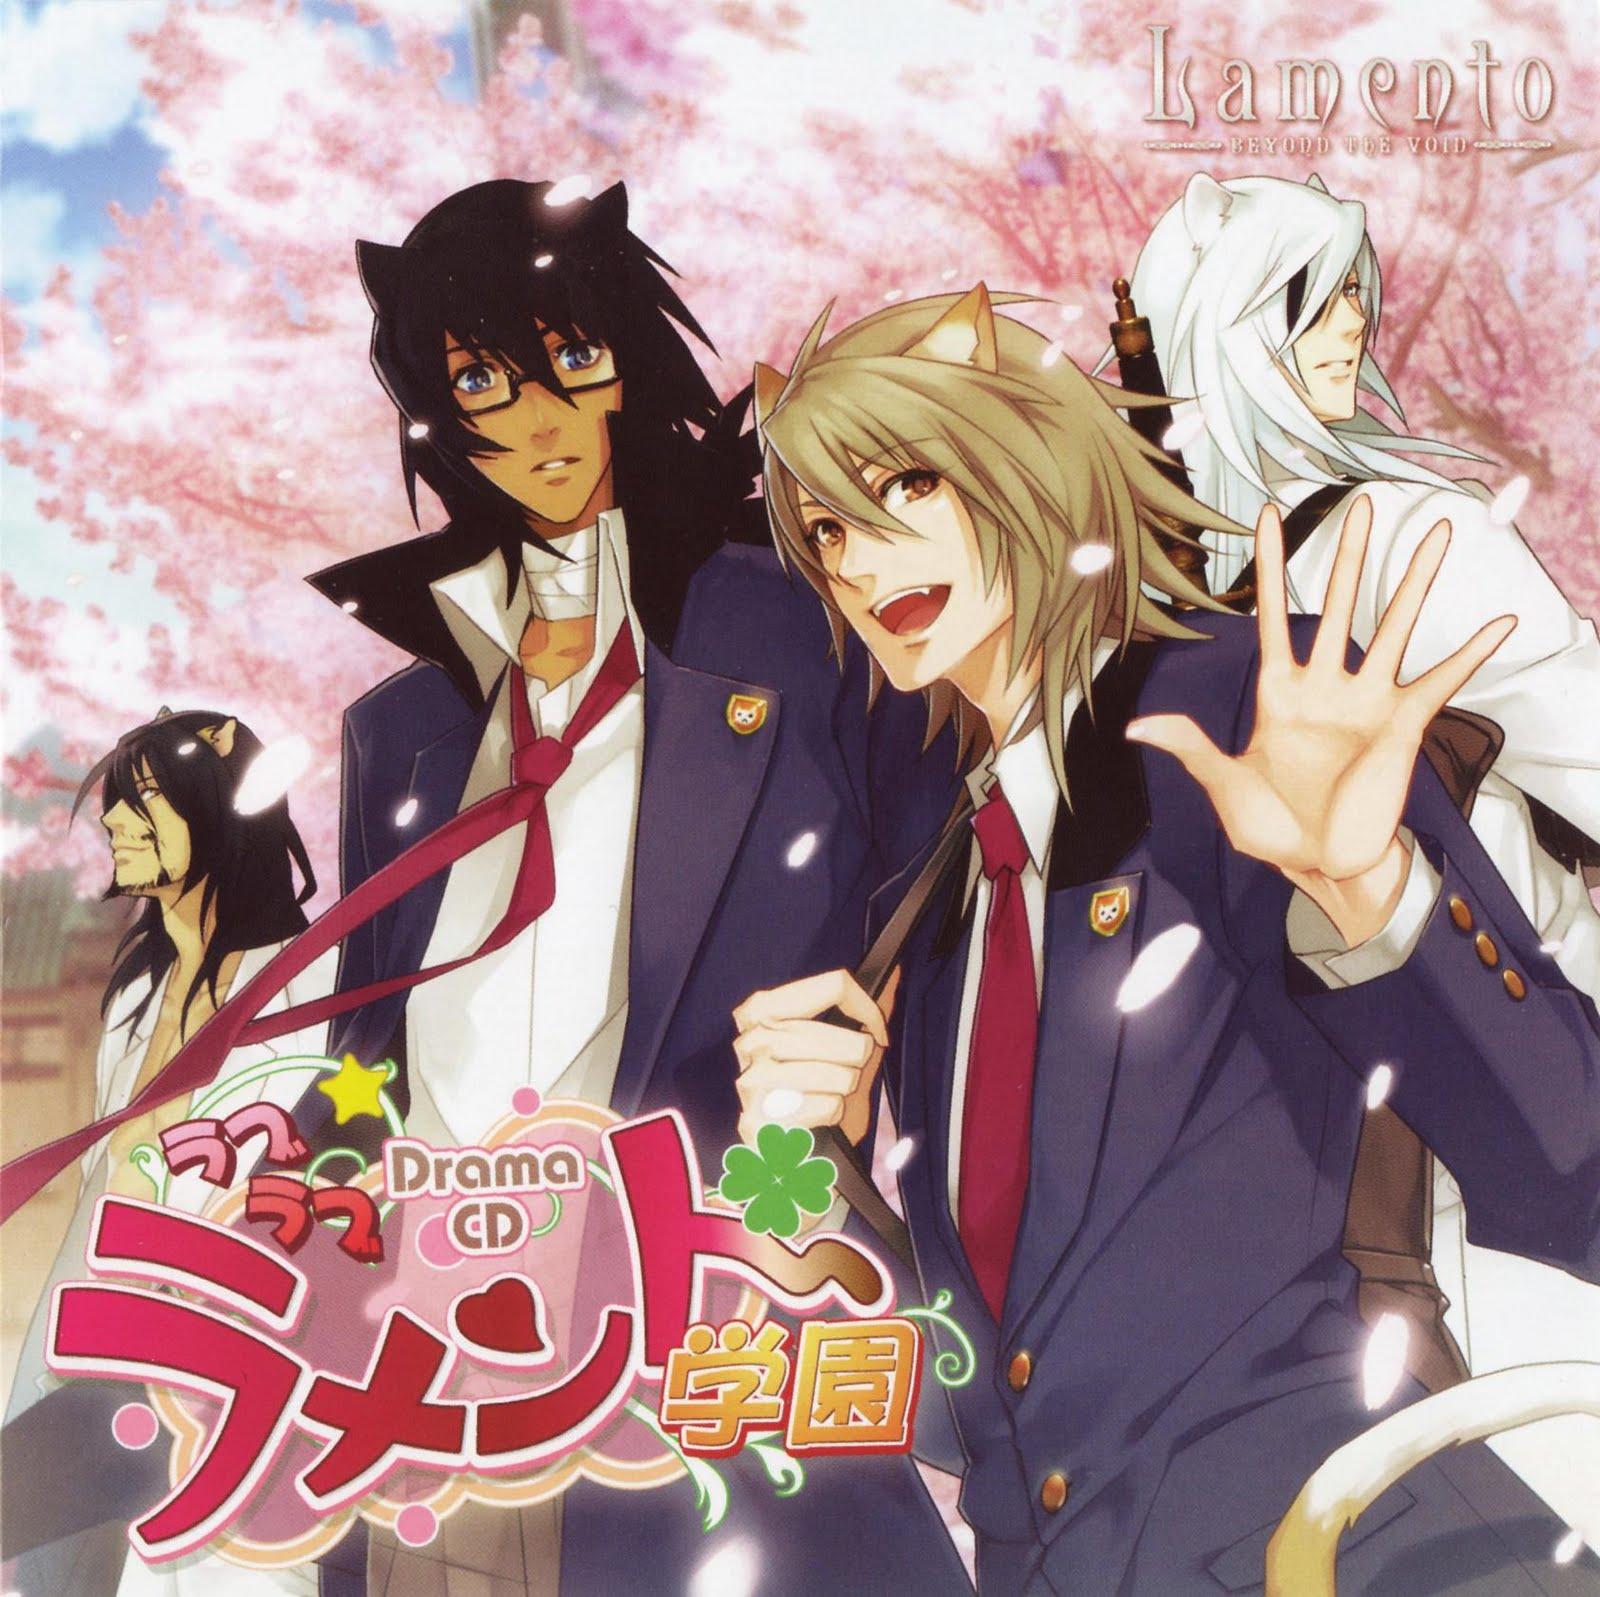 Love Love Lamento Gakuen (Drama CD) | Lamento -Beyond the Void- Wiki